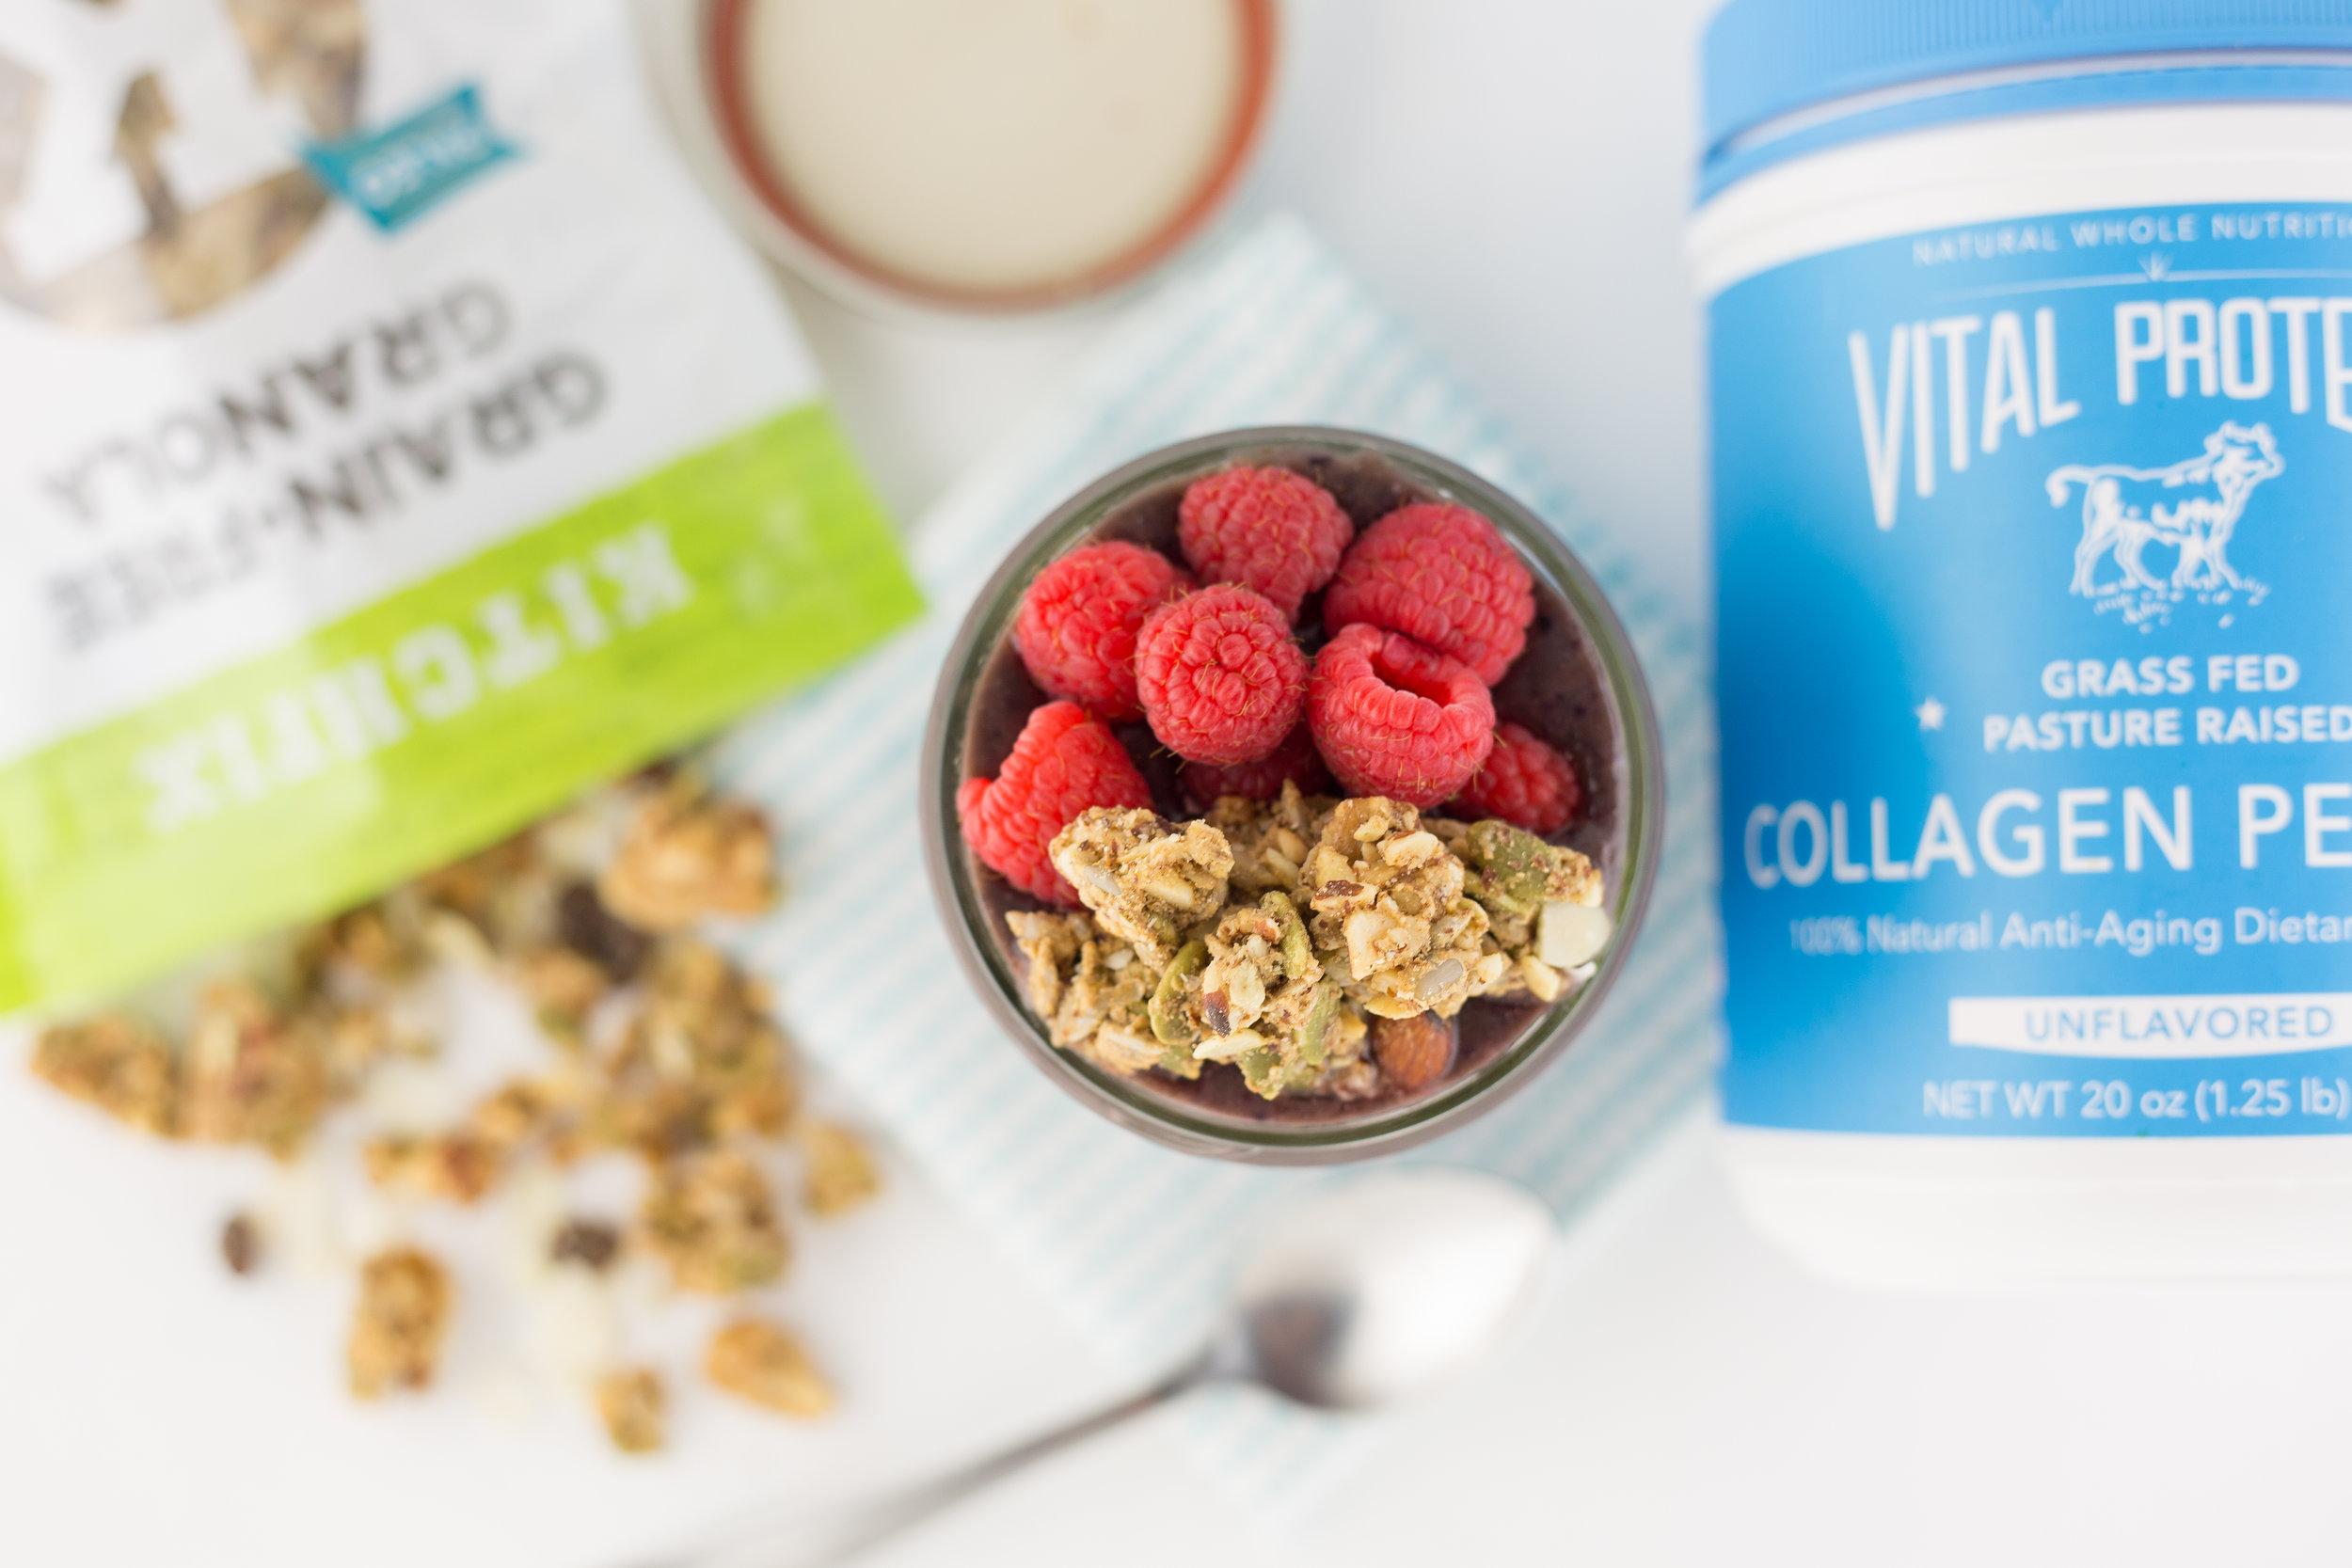 paleo smoothie, vital proteins, kitchfix granola, kitchfix foods, berry, fresh berry, paleo, paleo diet,